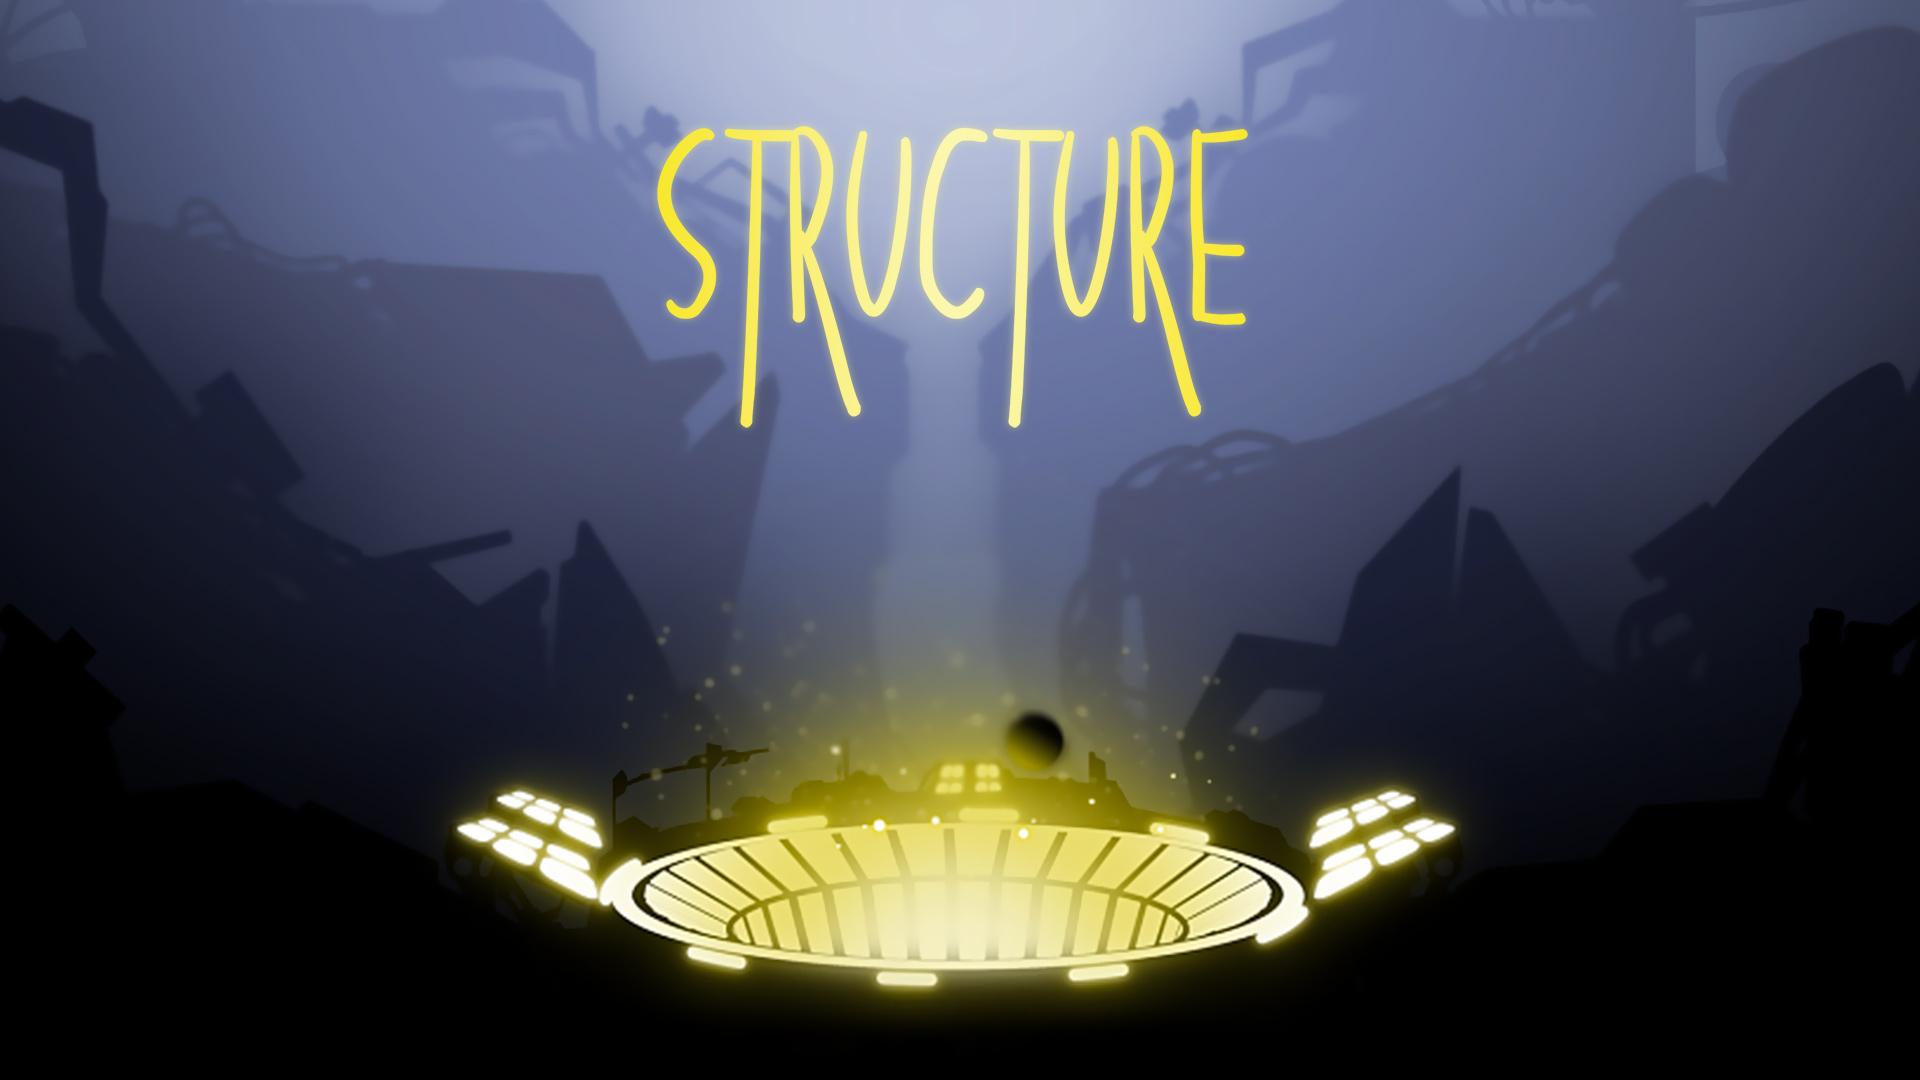 Structure_1920x1080_v2.jpg